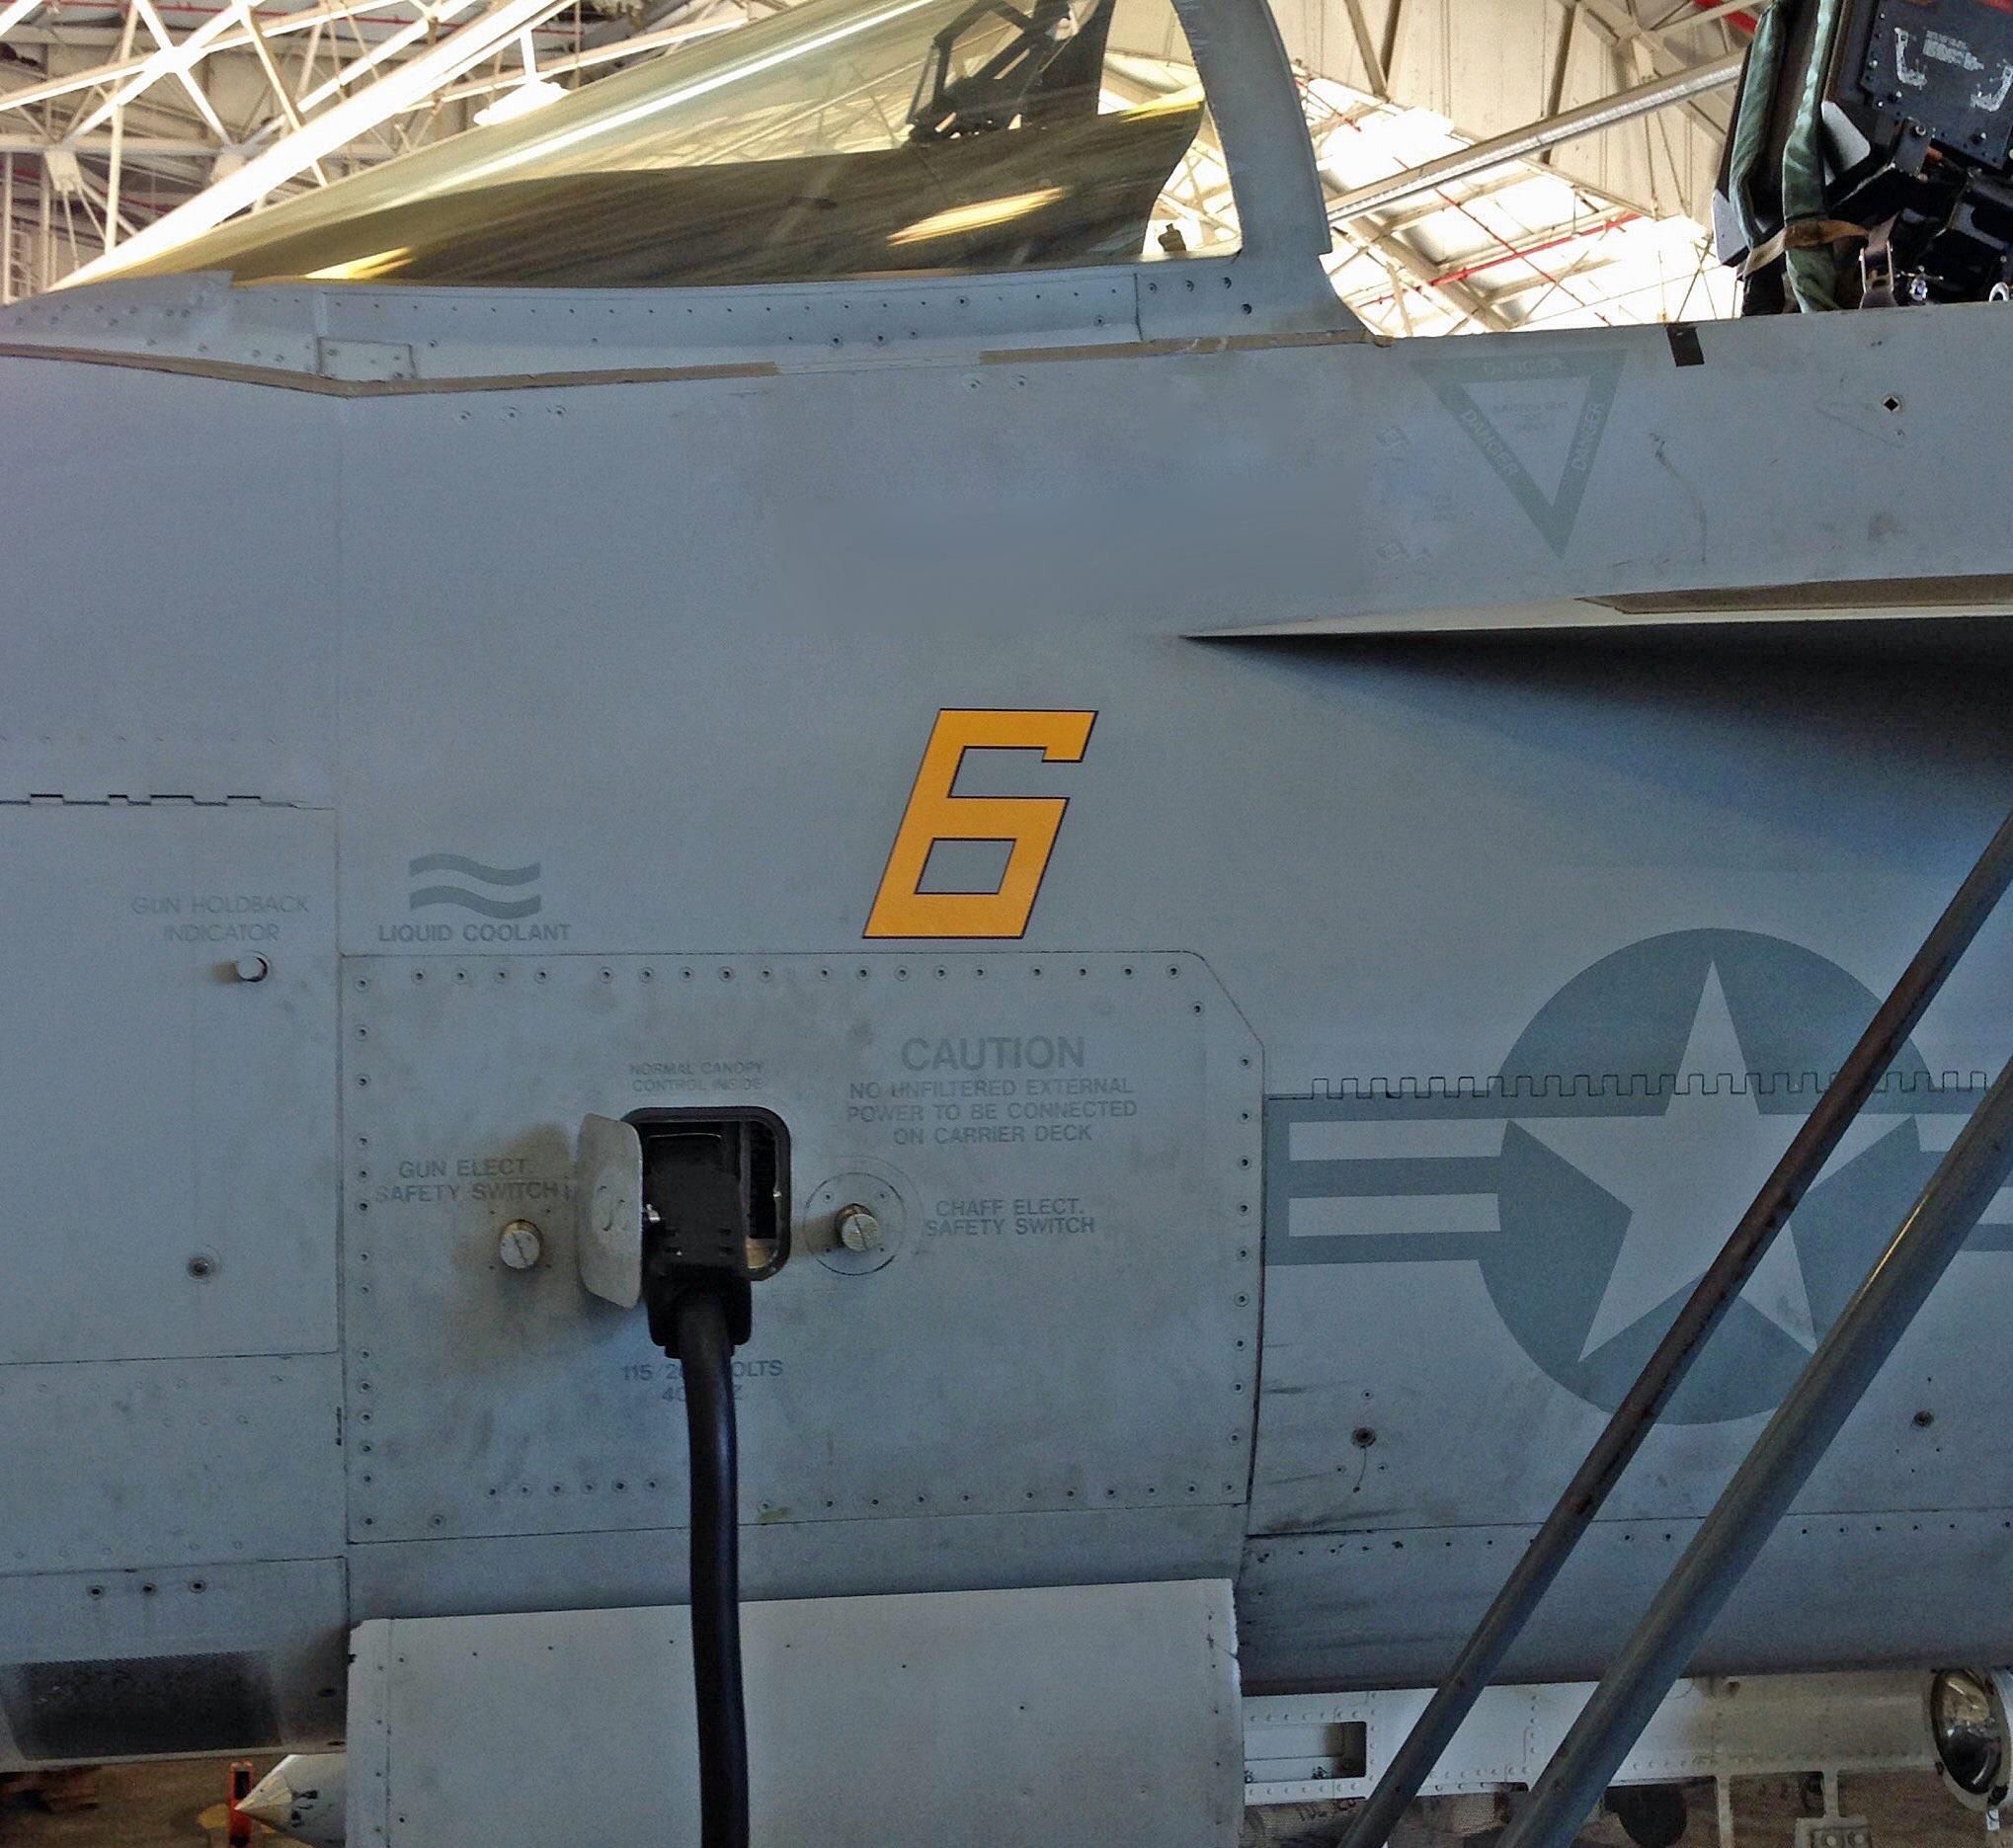 Photo courtesy of the U.S. Navy Tac Demo Team.